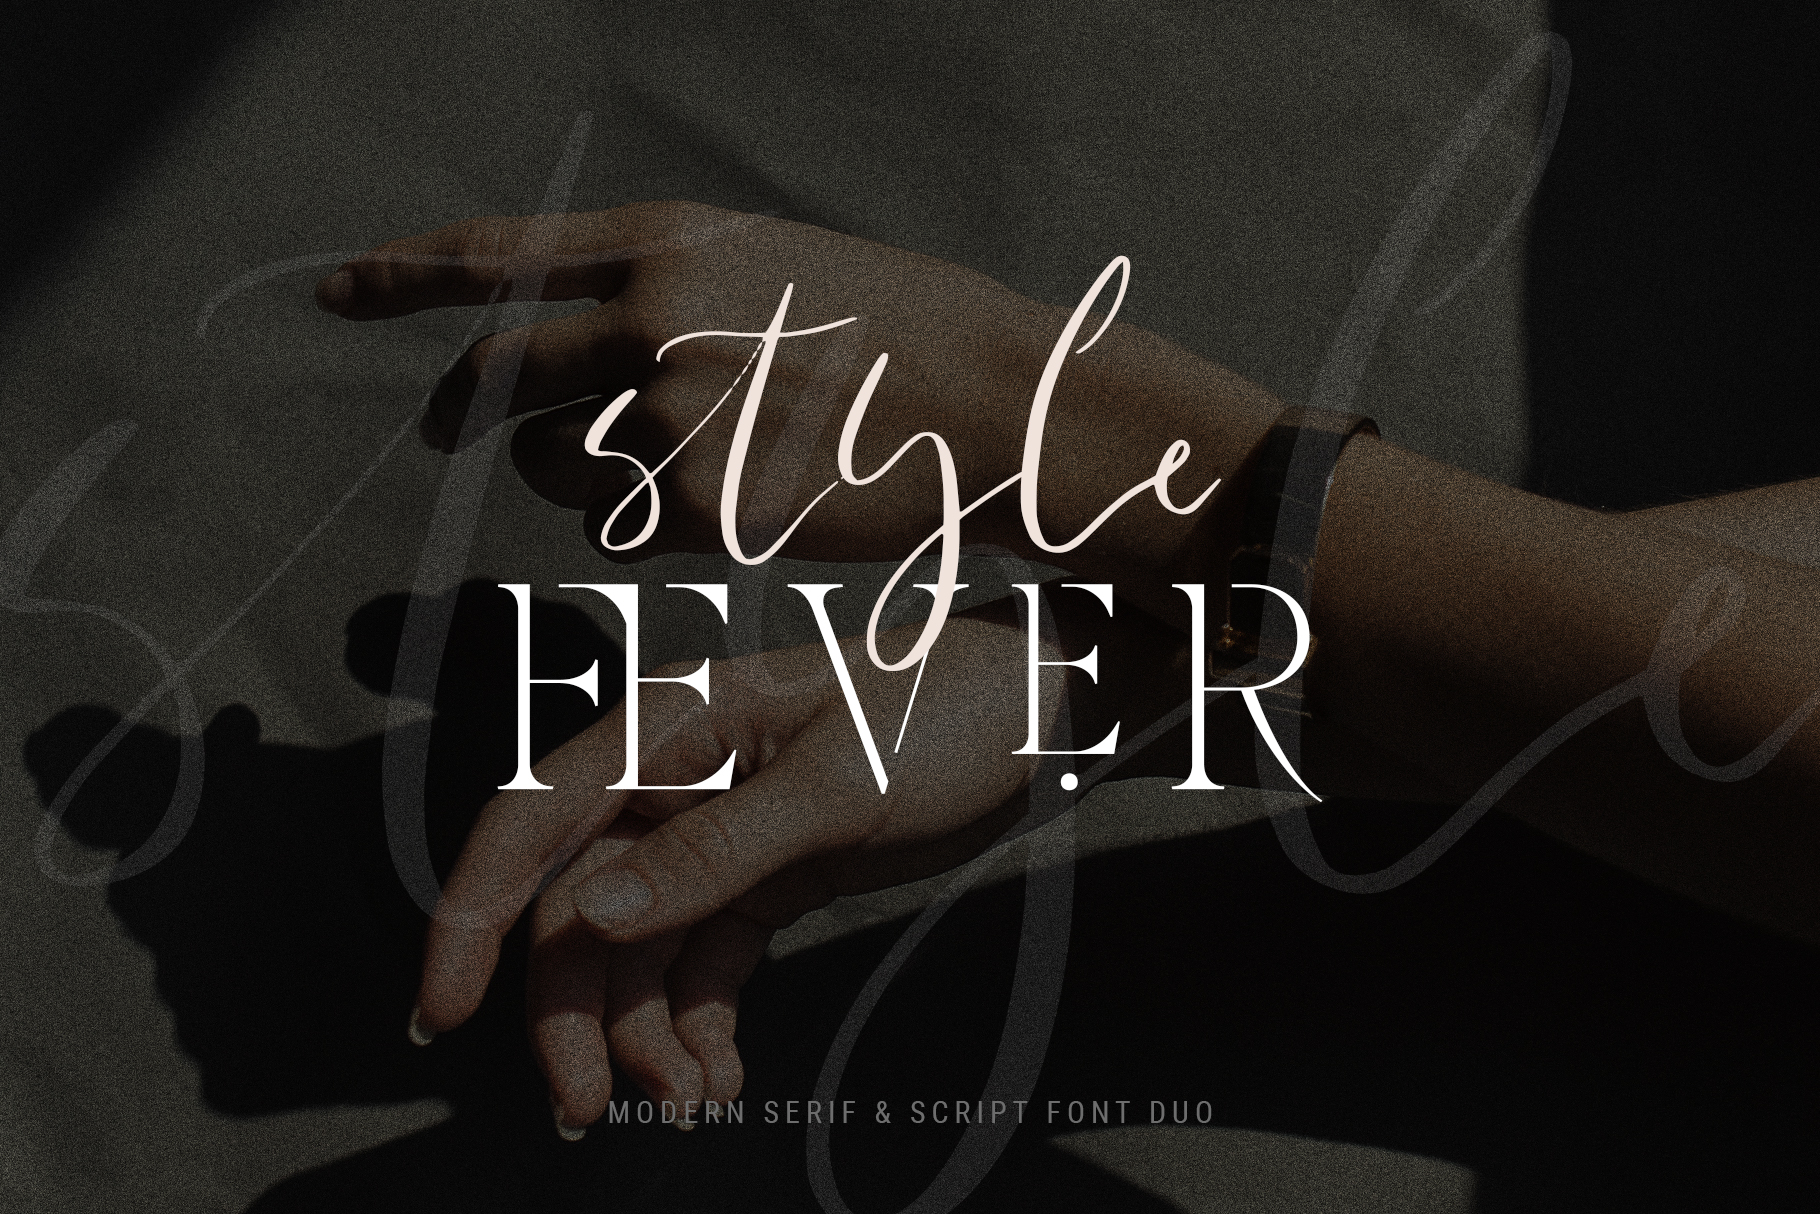 Verona Amore - Modern Serif & Script Font Duo & Extras example image 7